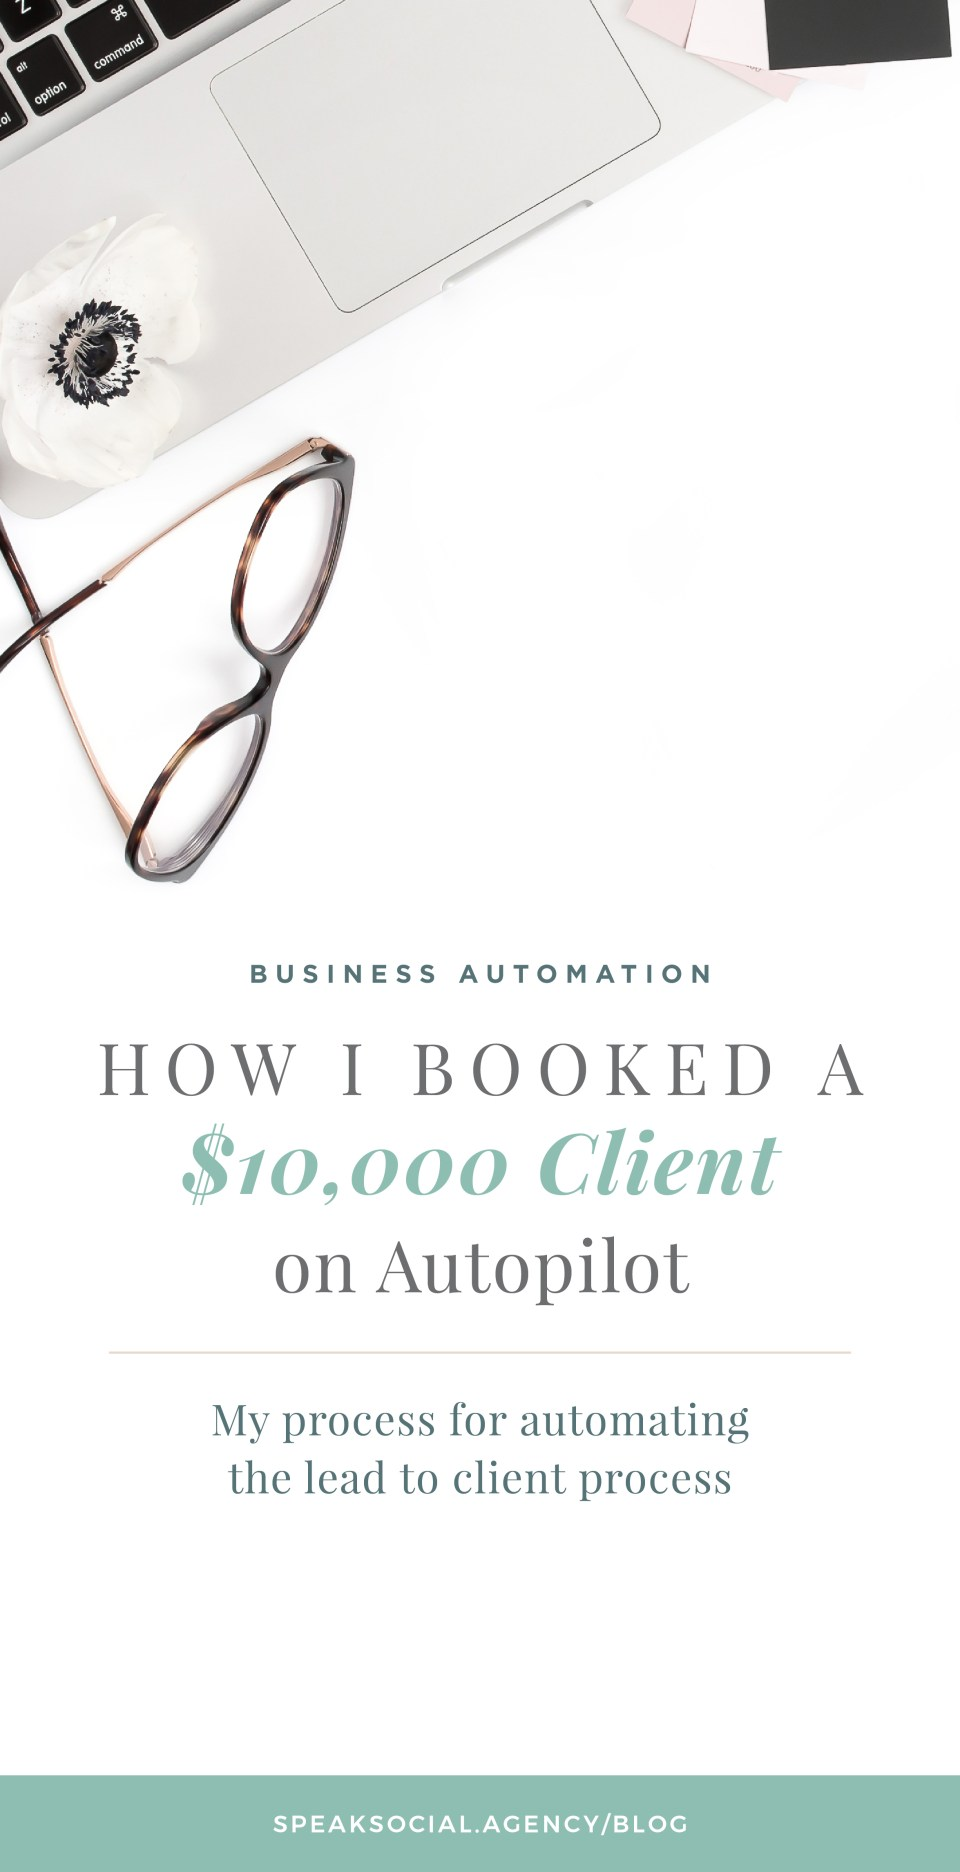 Dubsado-How I booked a $10,000 client on Autopilot using Dubsado CRM